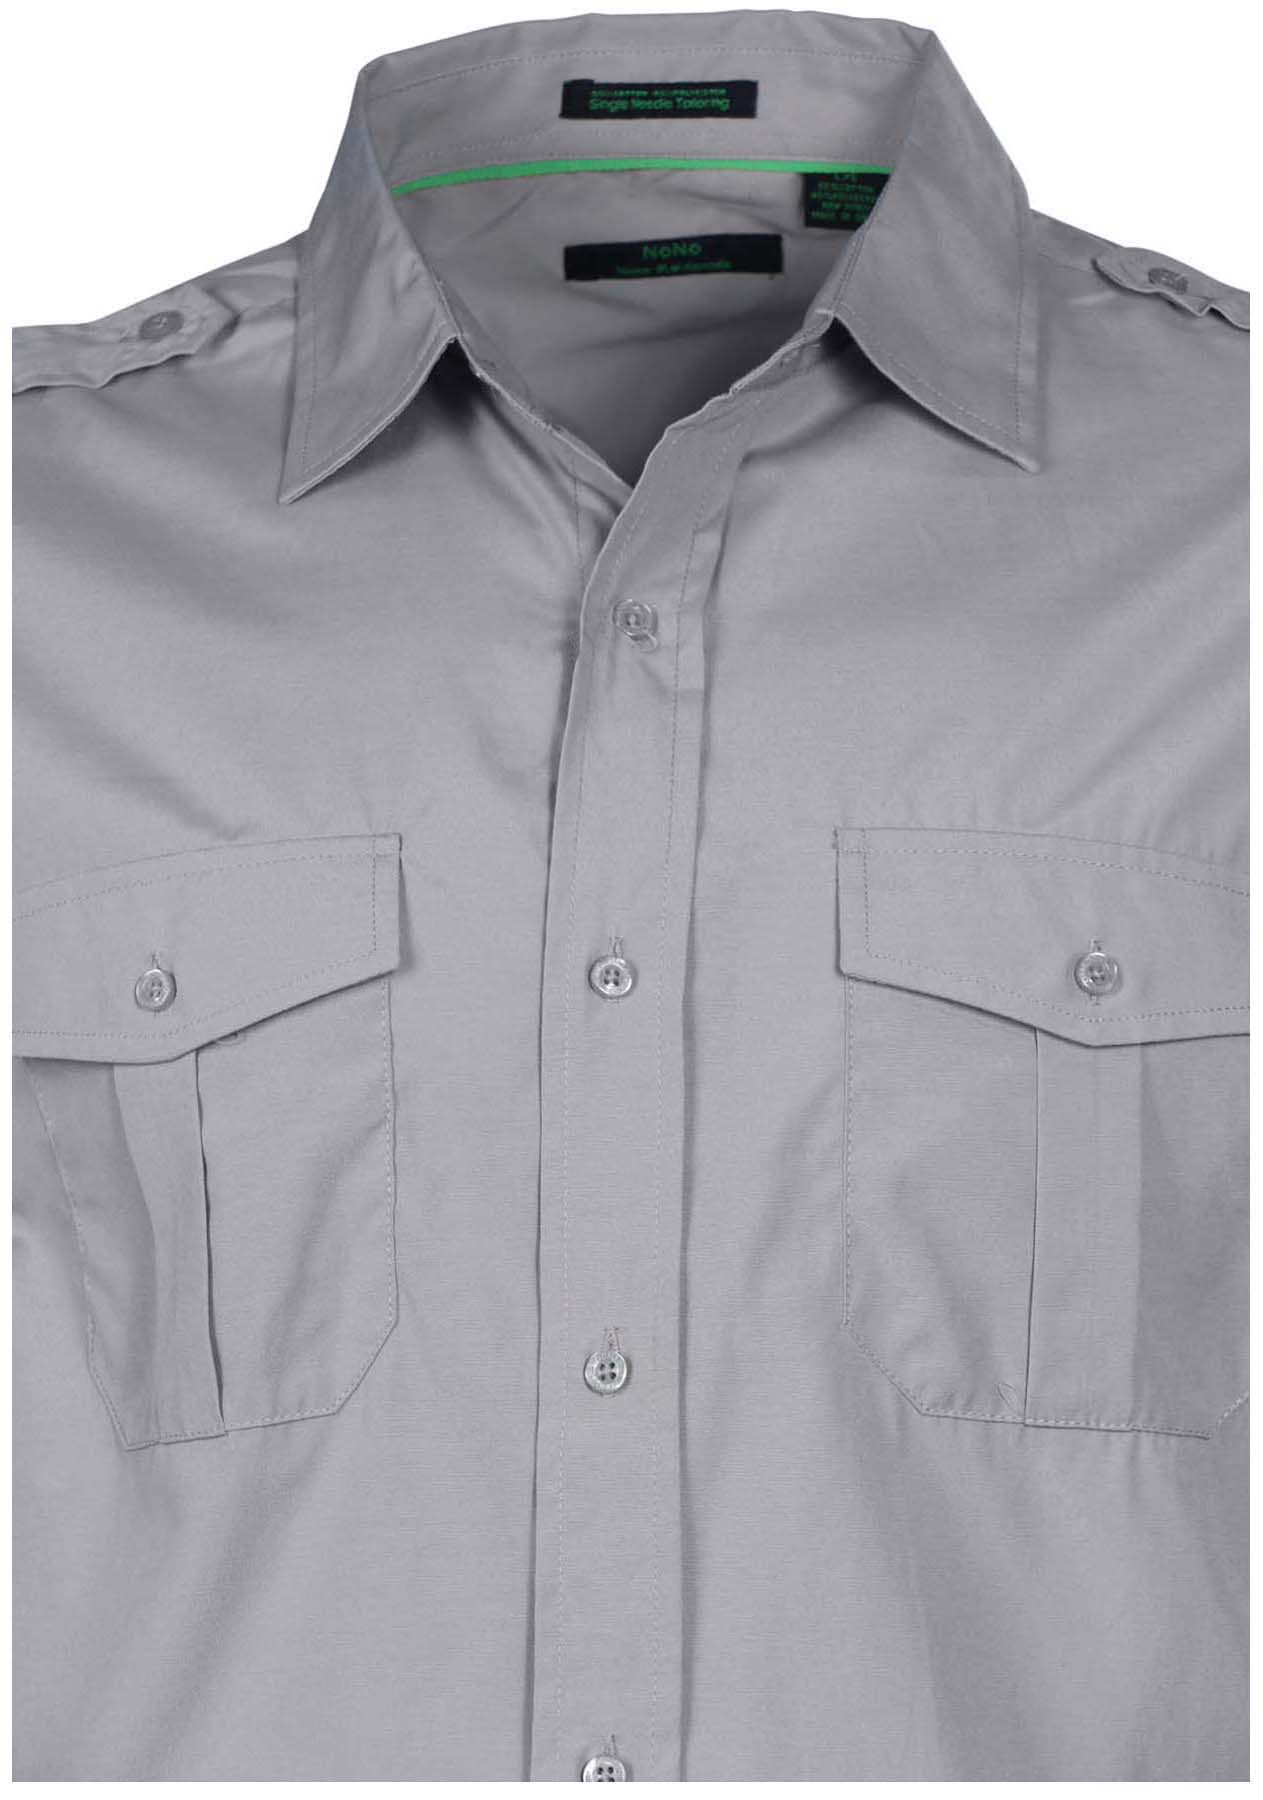 NoNo Maldonado Men's Casual Button Down Shirt | eBay